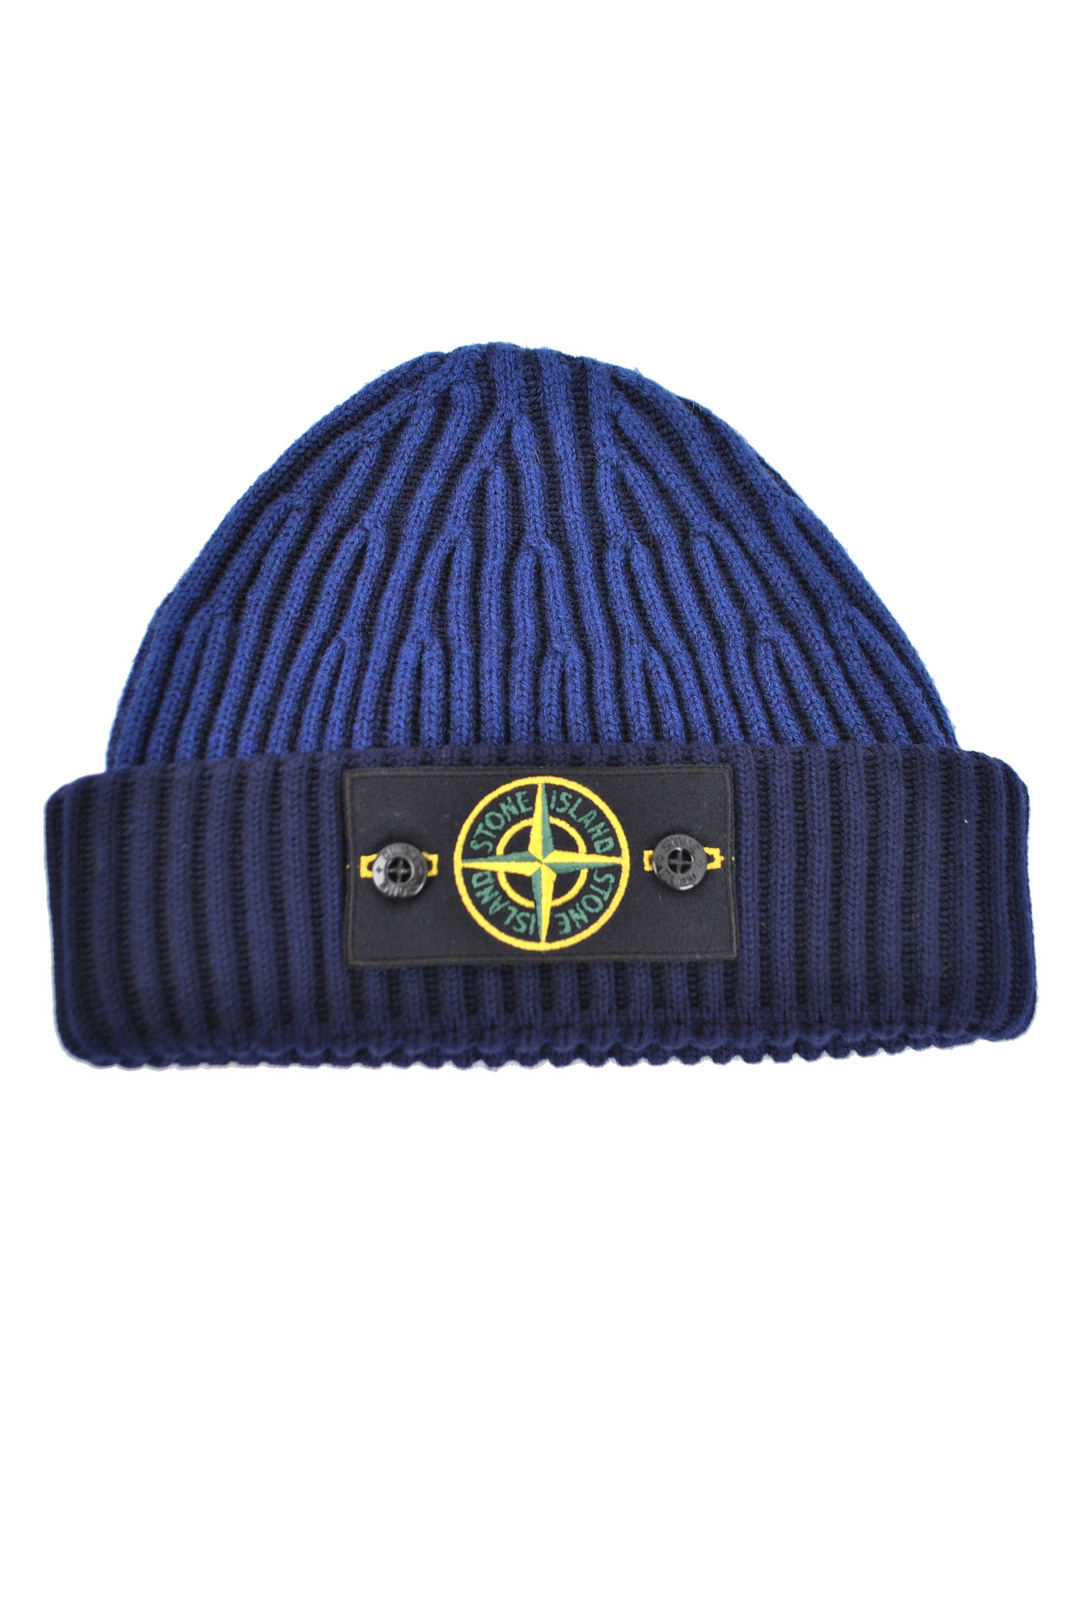 Fashionable Winter Hats